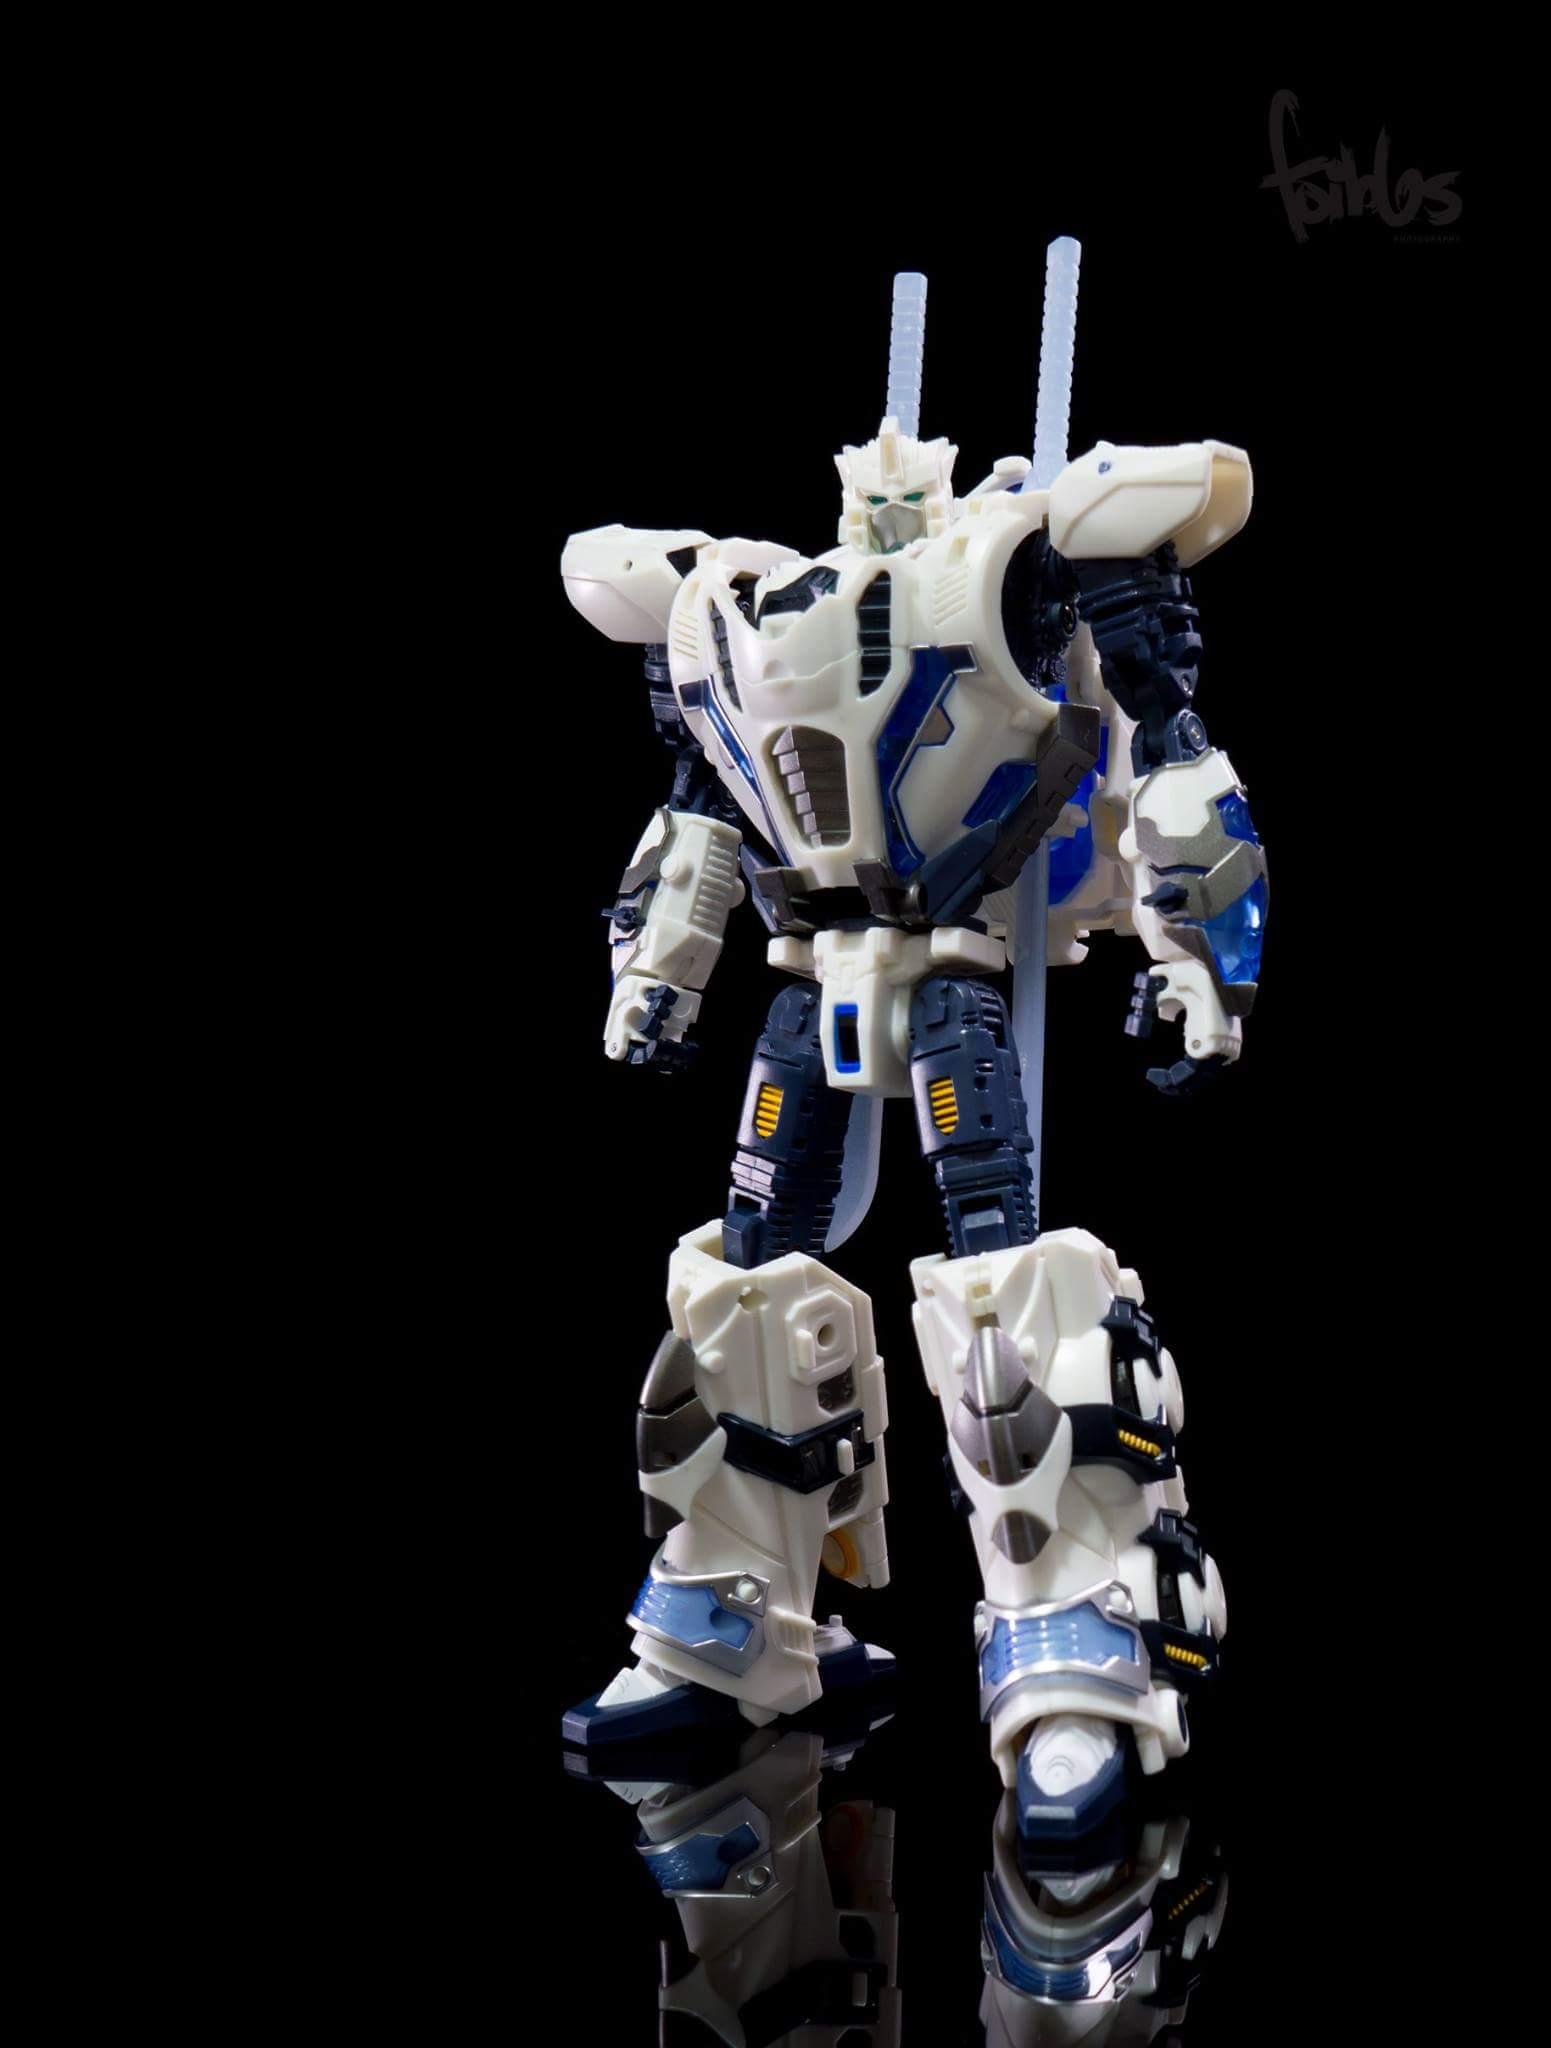 [Mastermind Creations] Produit Tiers - Reformatted R-11 Seraphicus Prominon - aka Nova Prime RVXq5H8B